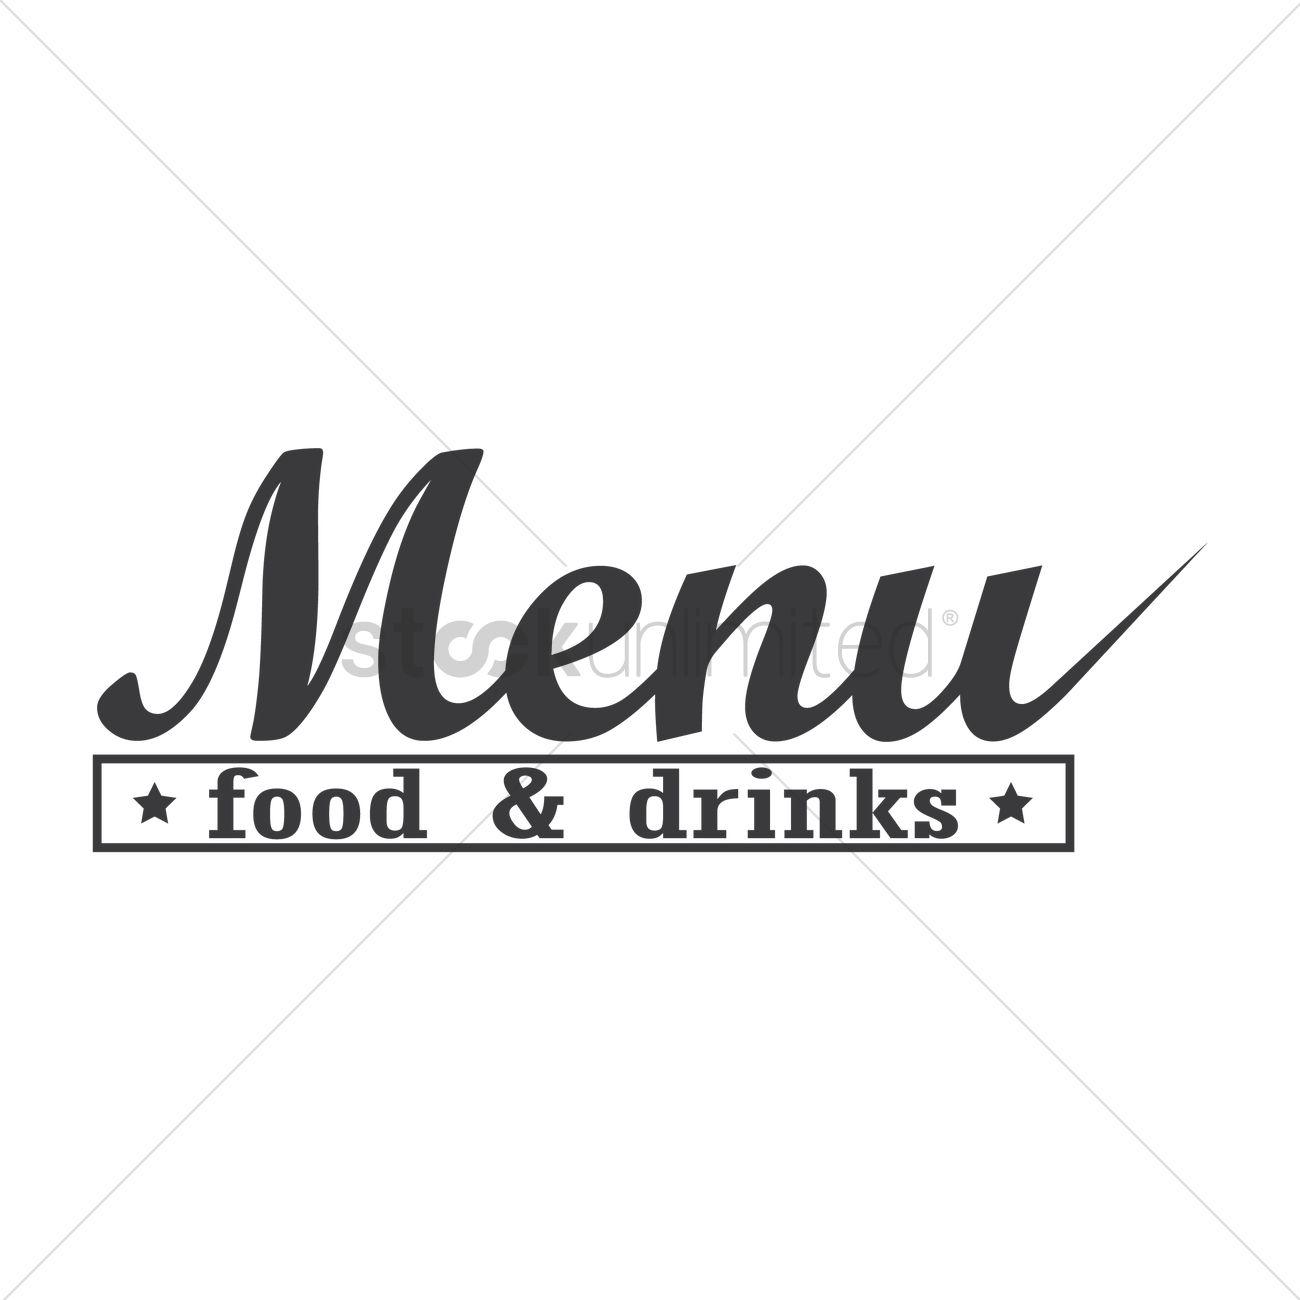 Food and drinks menu logo icon Vector Image - 1710138 ...